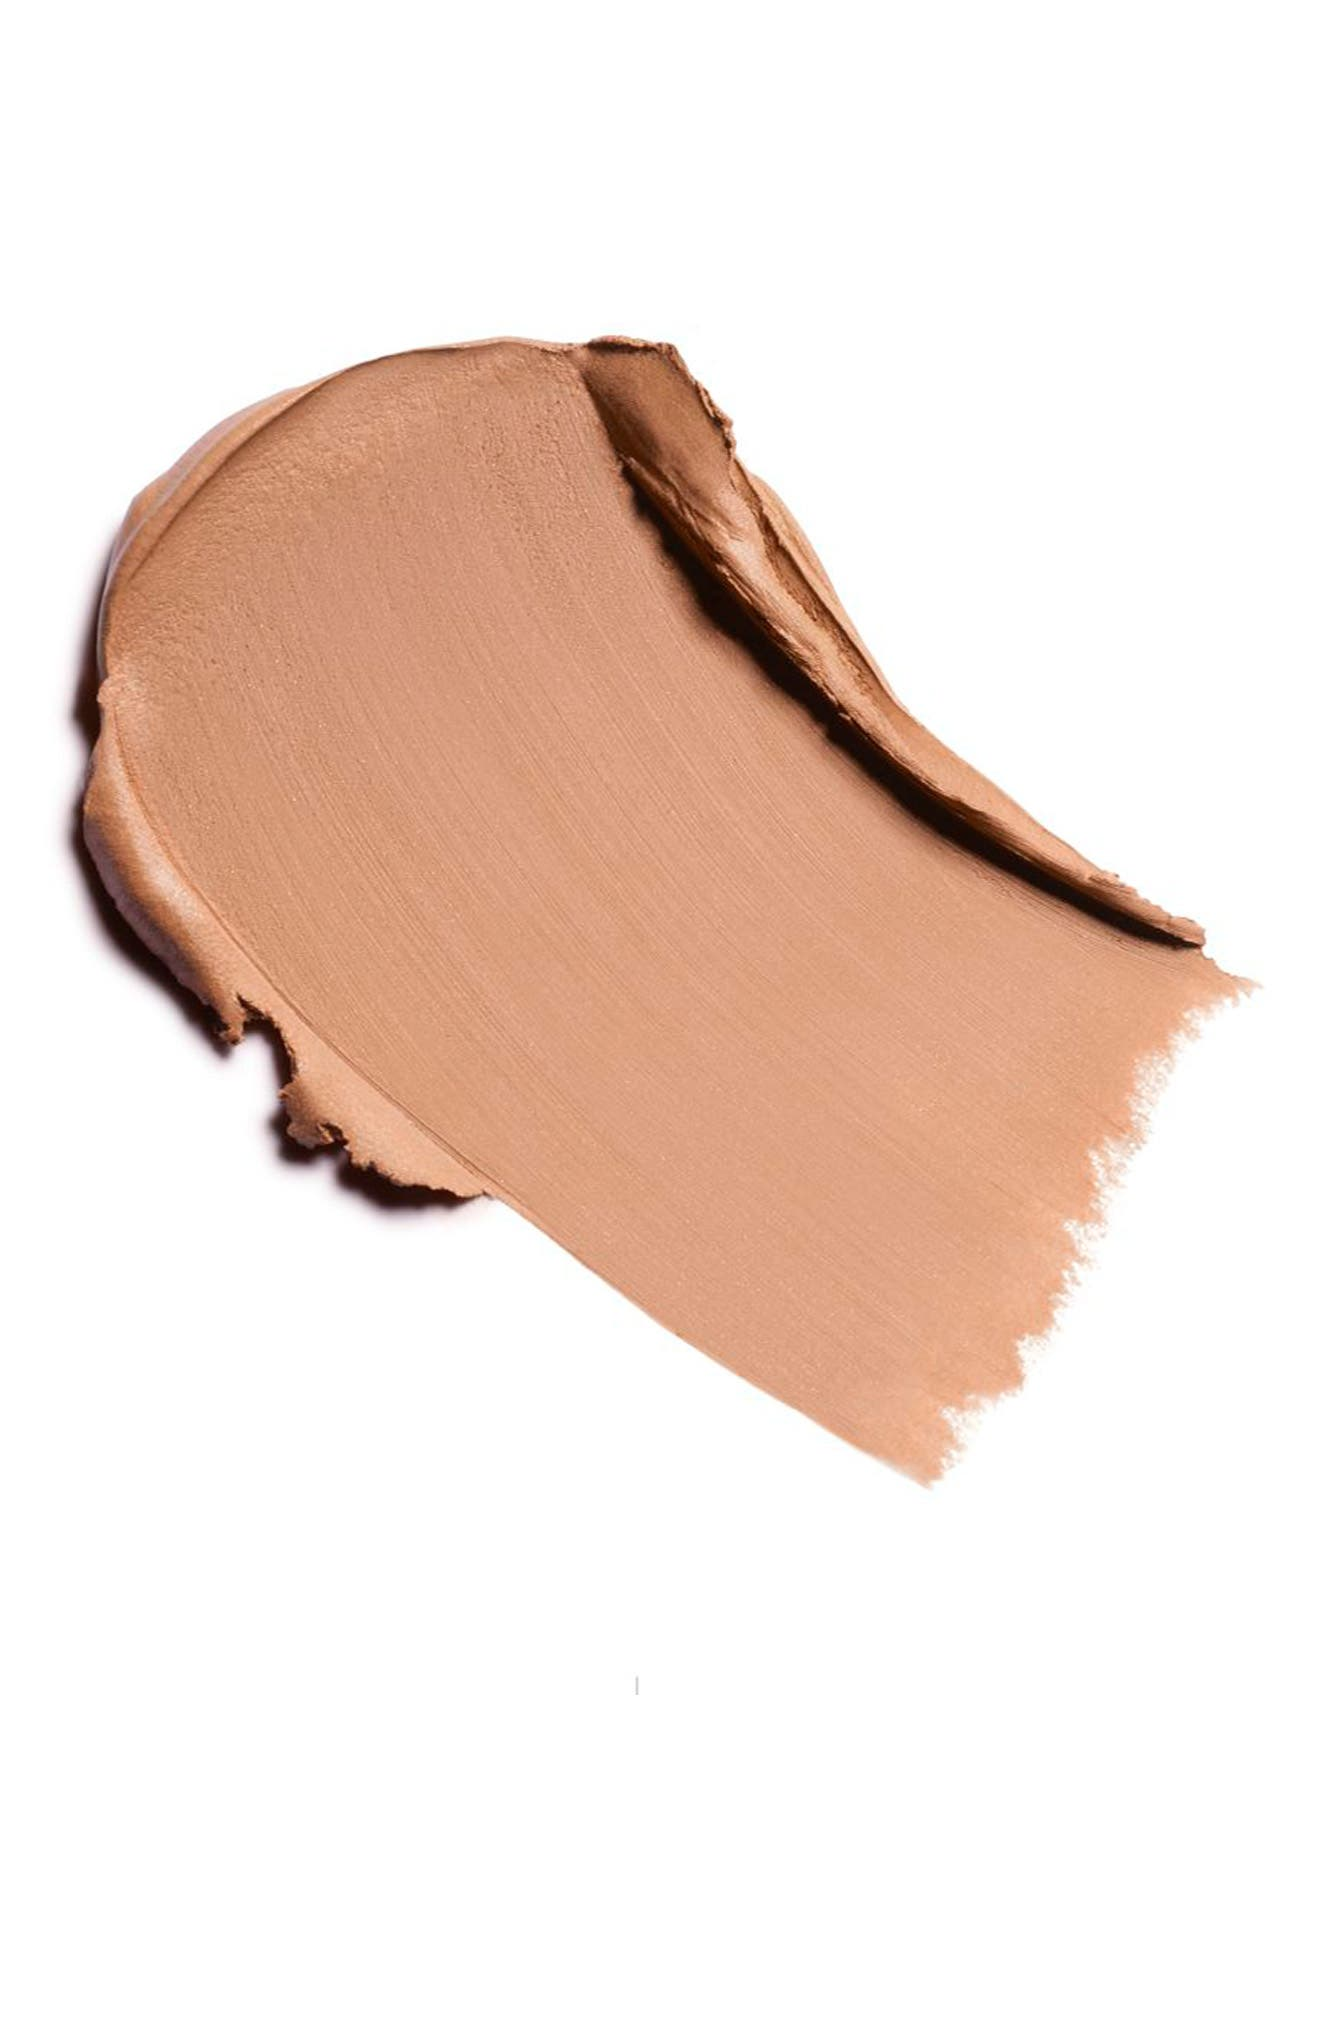 CHANEL, SOLEIL TAN DE CHANEL<br />Bronzing Makeup Base, Alternate thumbnail 2, color, 30 BRONZING